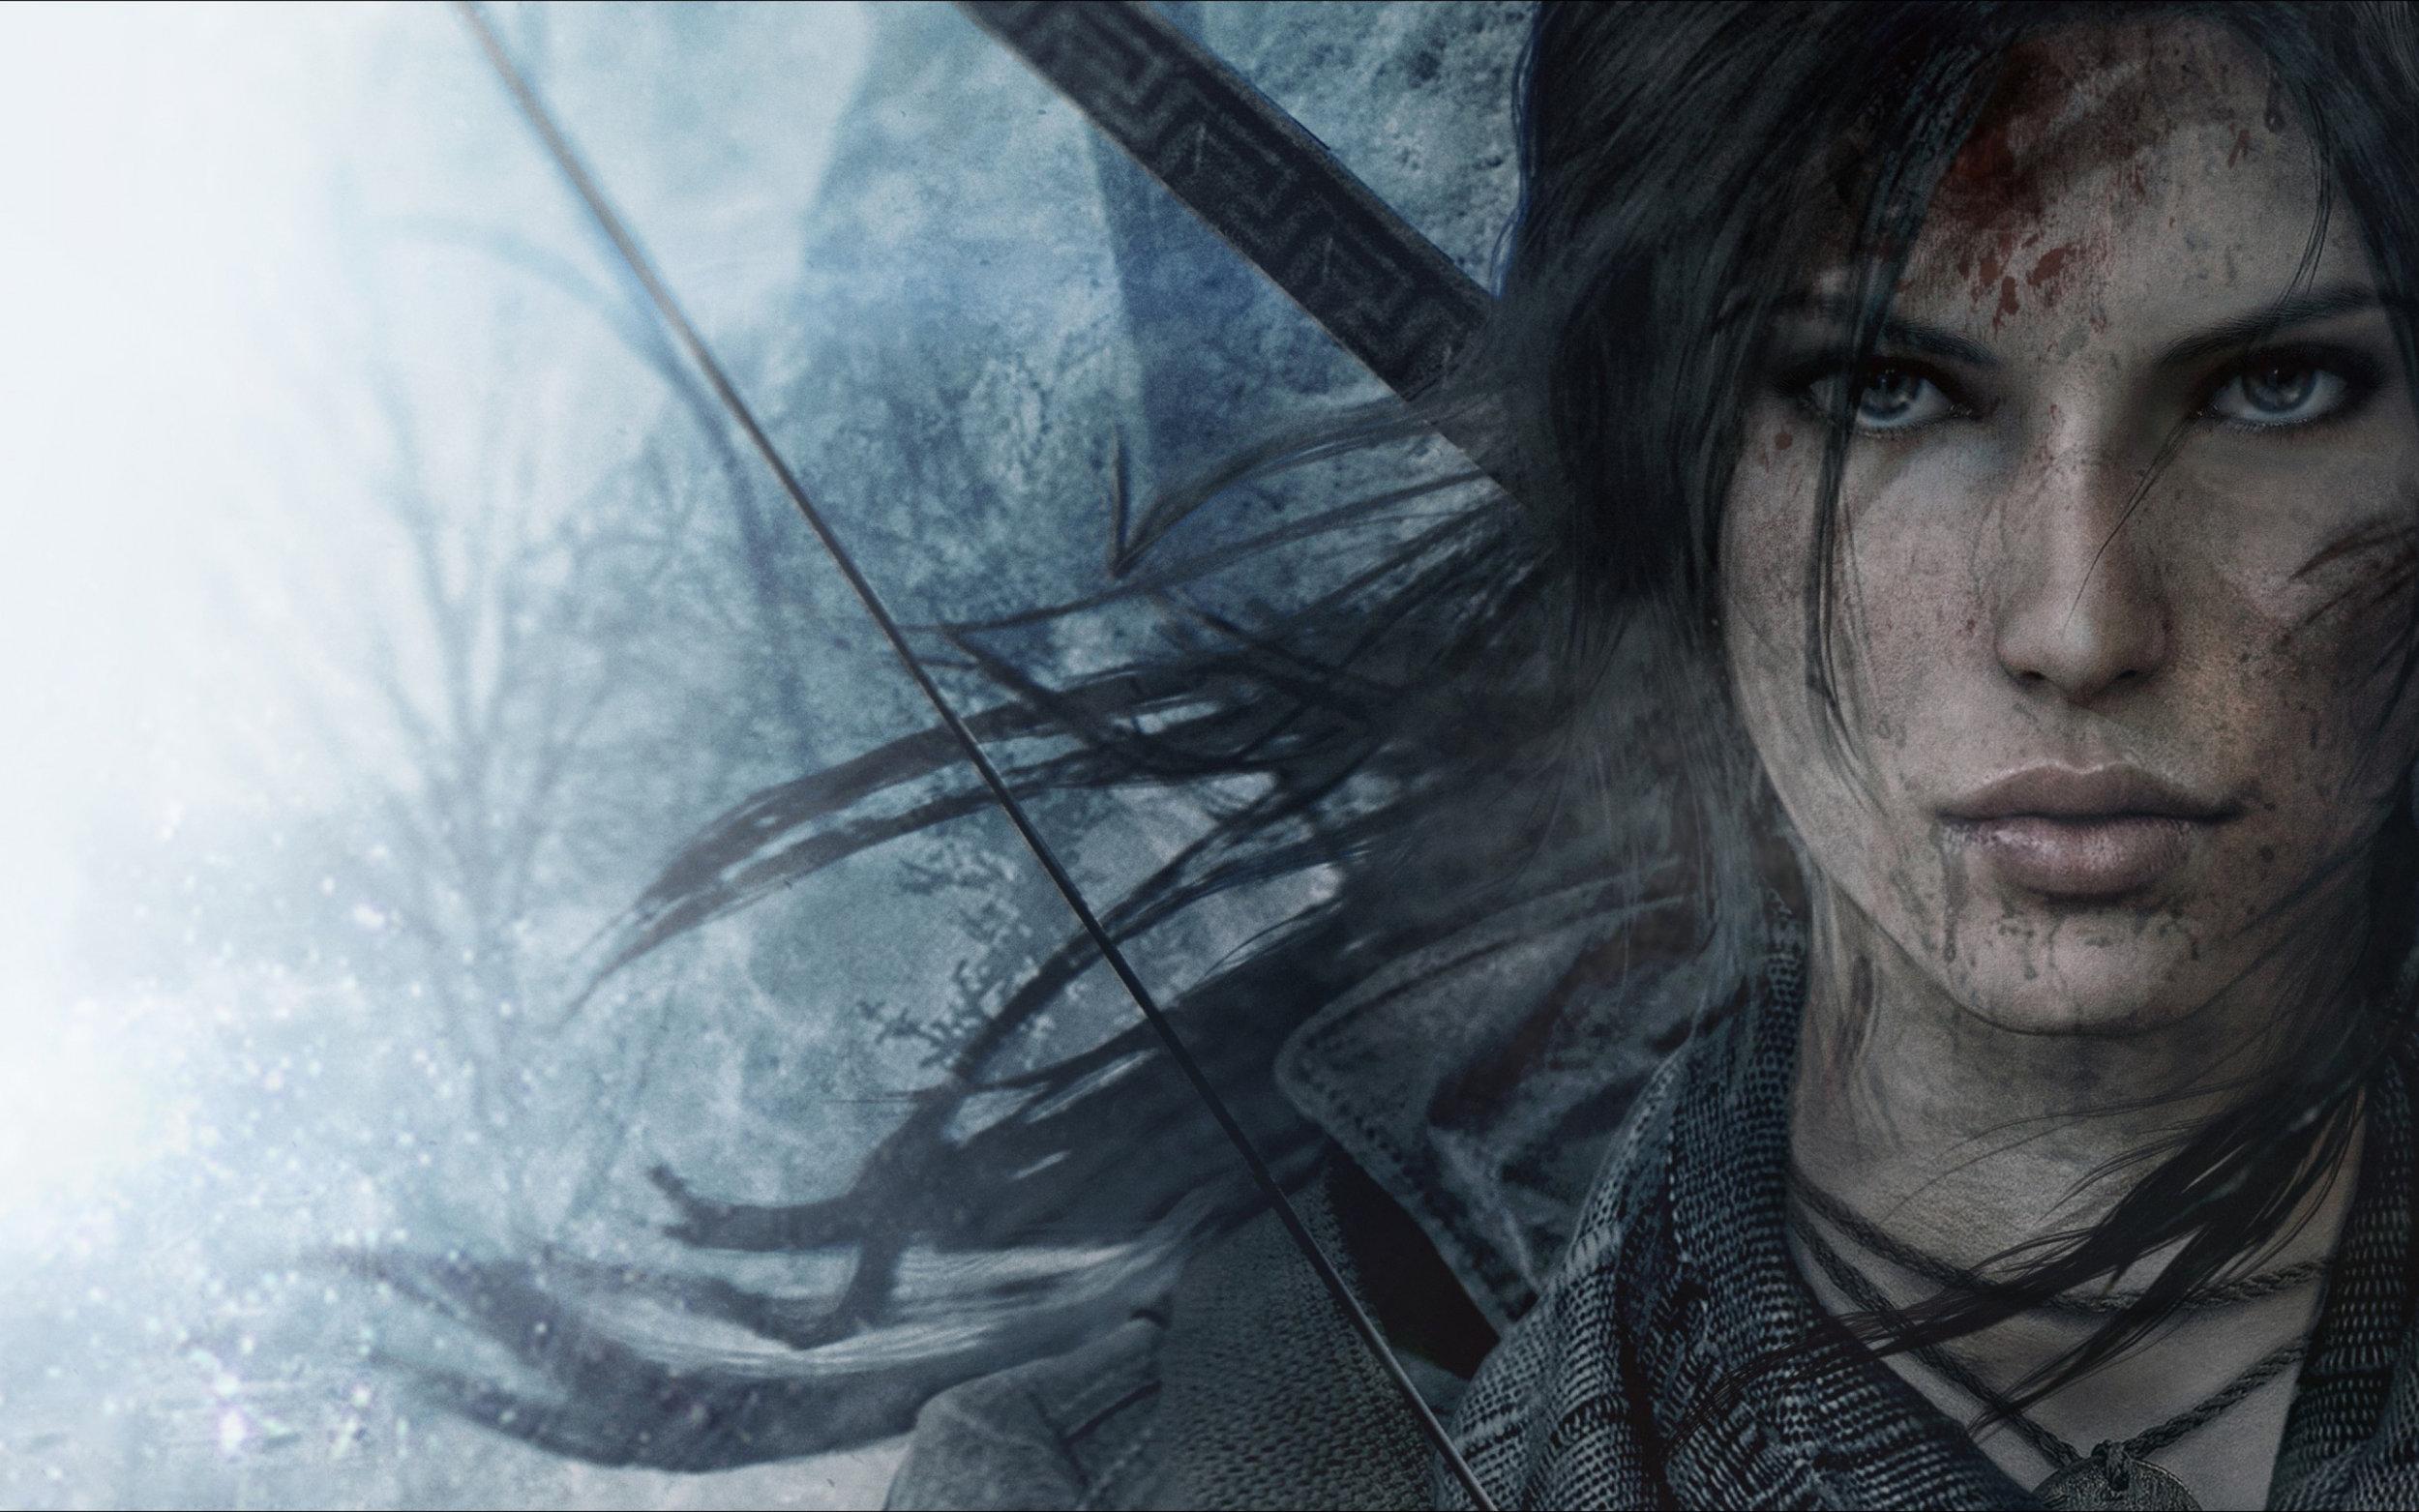 lara_croft_rise_of_the_tomb_raider_face_104804_3840x2400.jpg